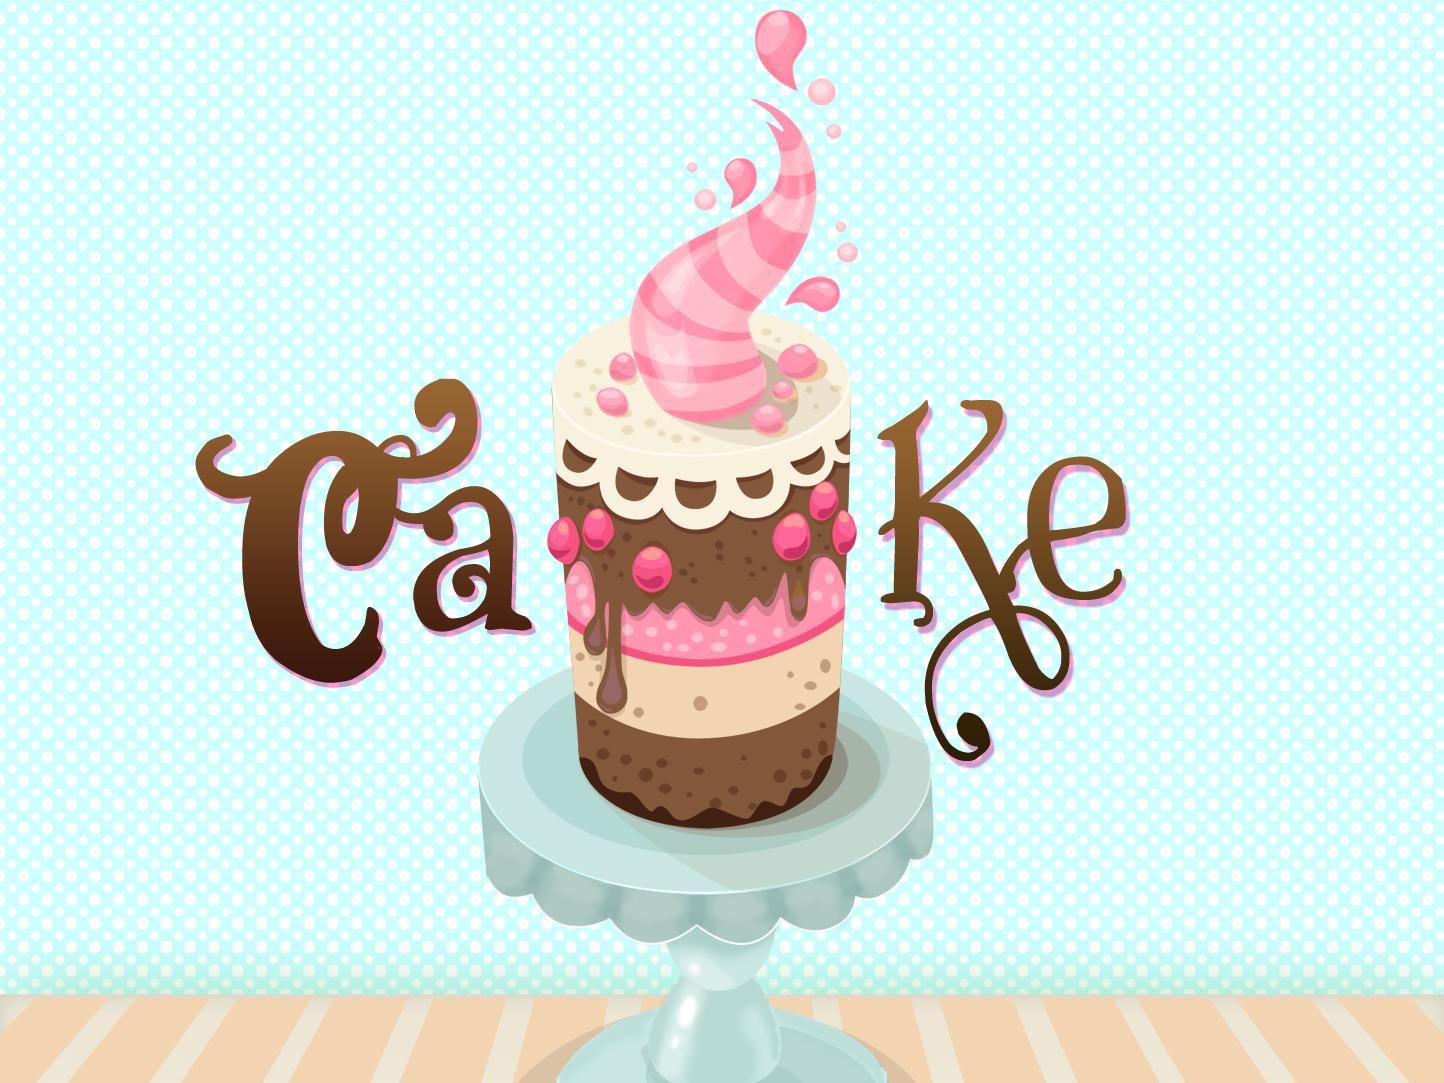 Colorful Cake Illustration illustration